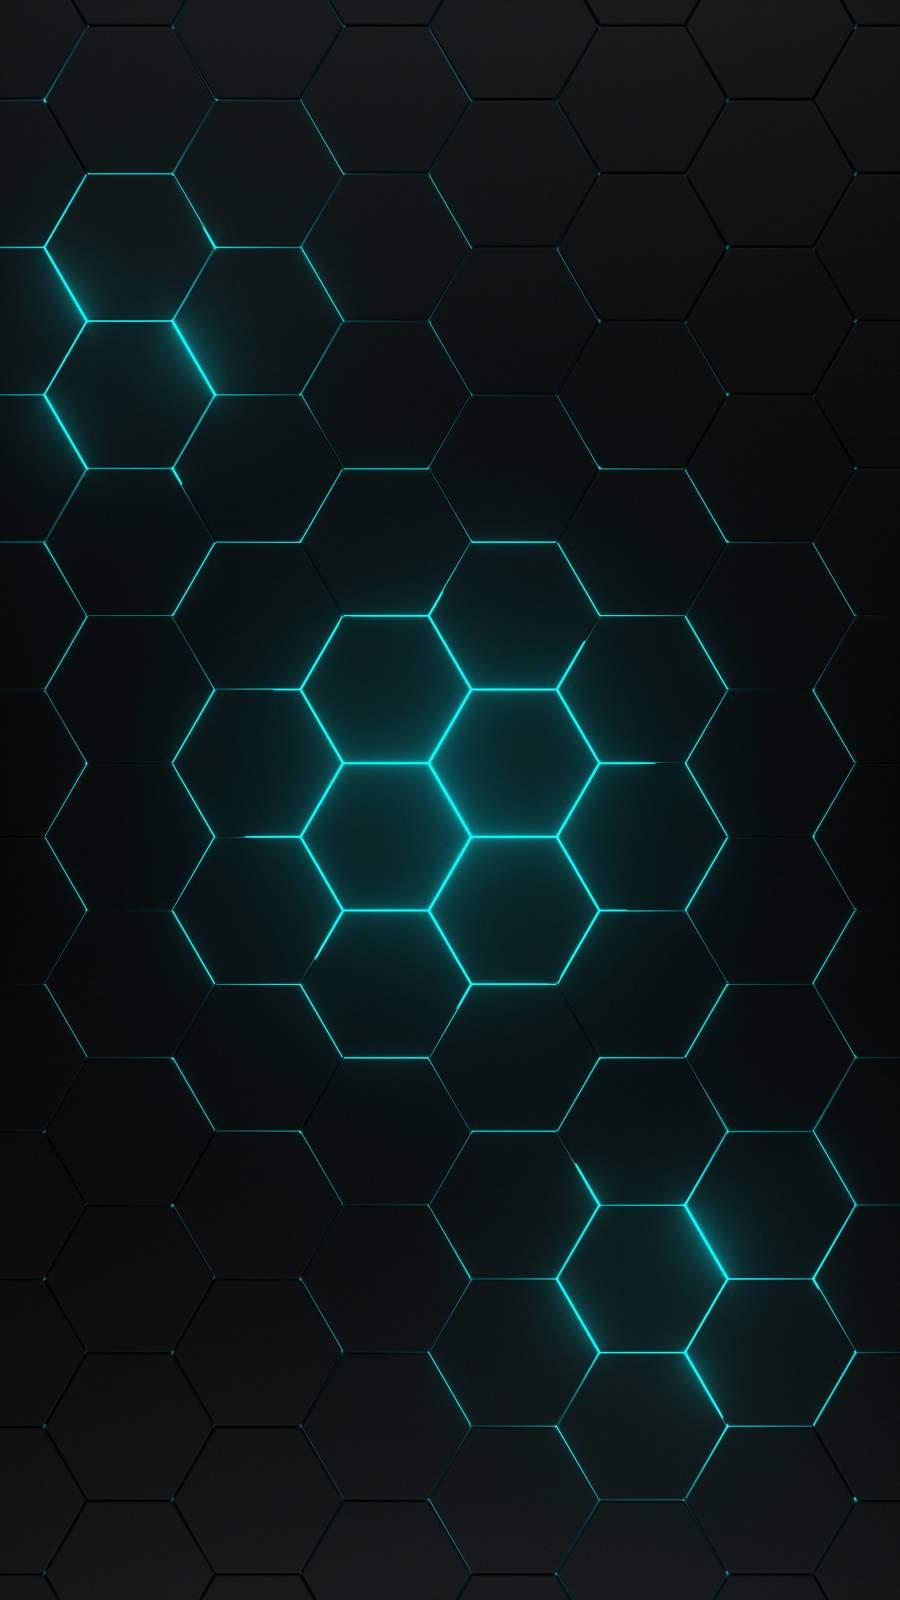 Honeycomb Pattern iPhone Wallpaper